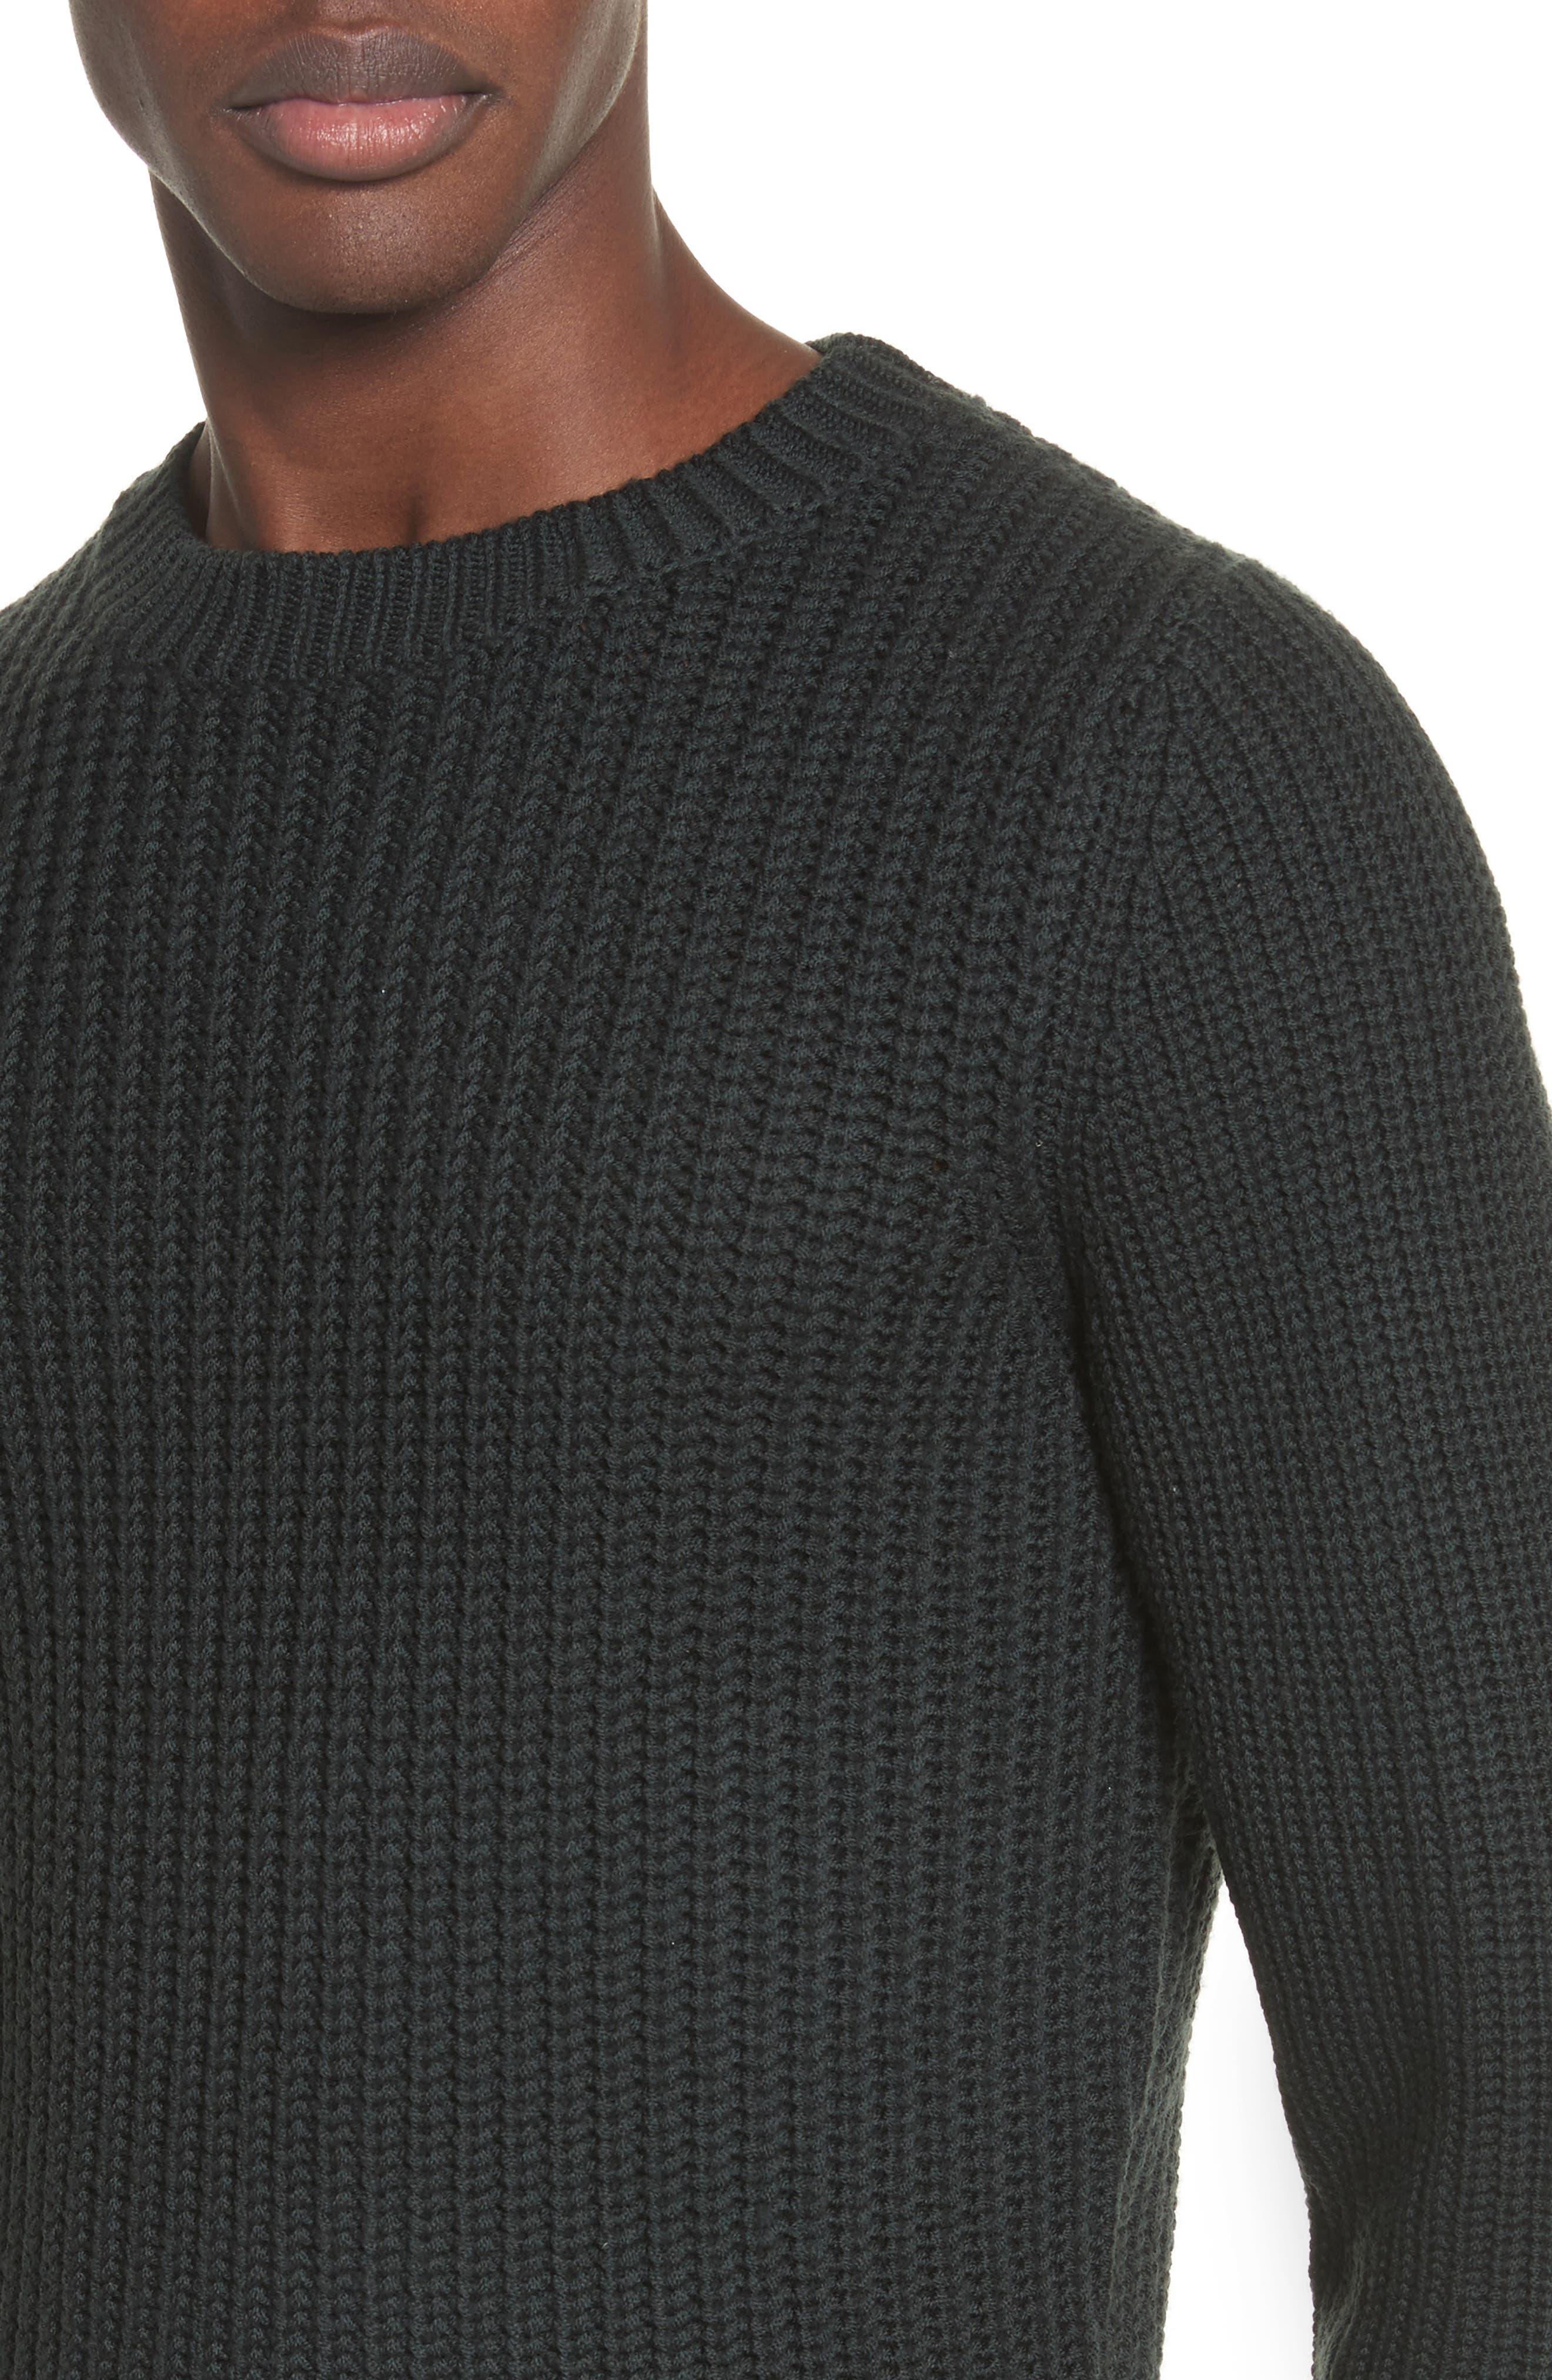 Pull Berger Merino Wool Sweater,                             Alternate thumbnail 4, color,                             Khaki Green